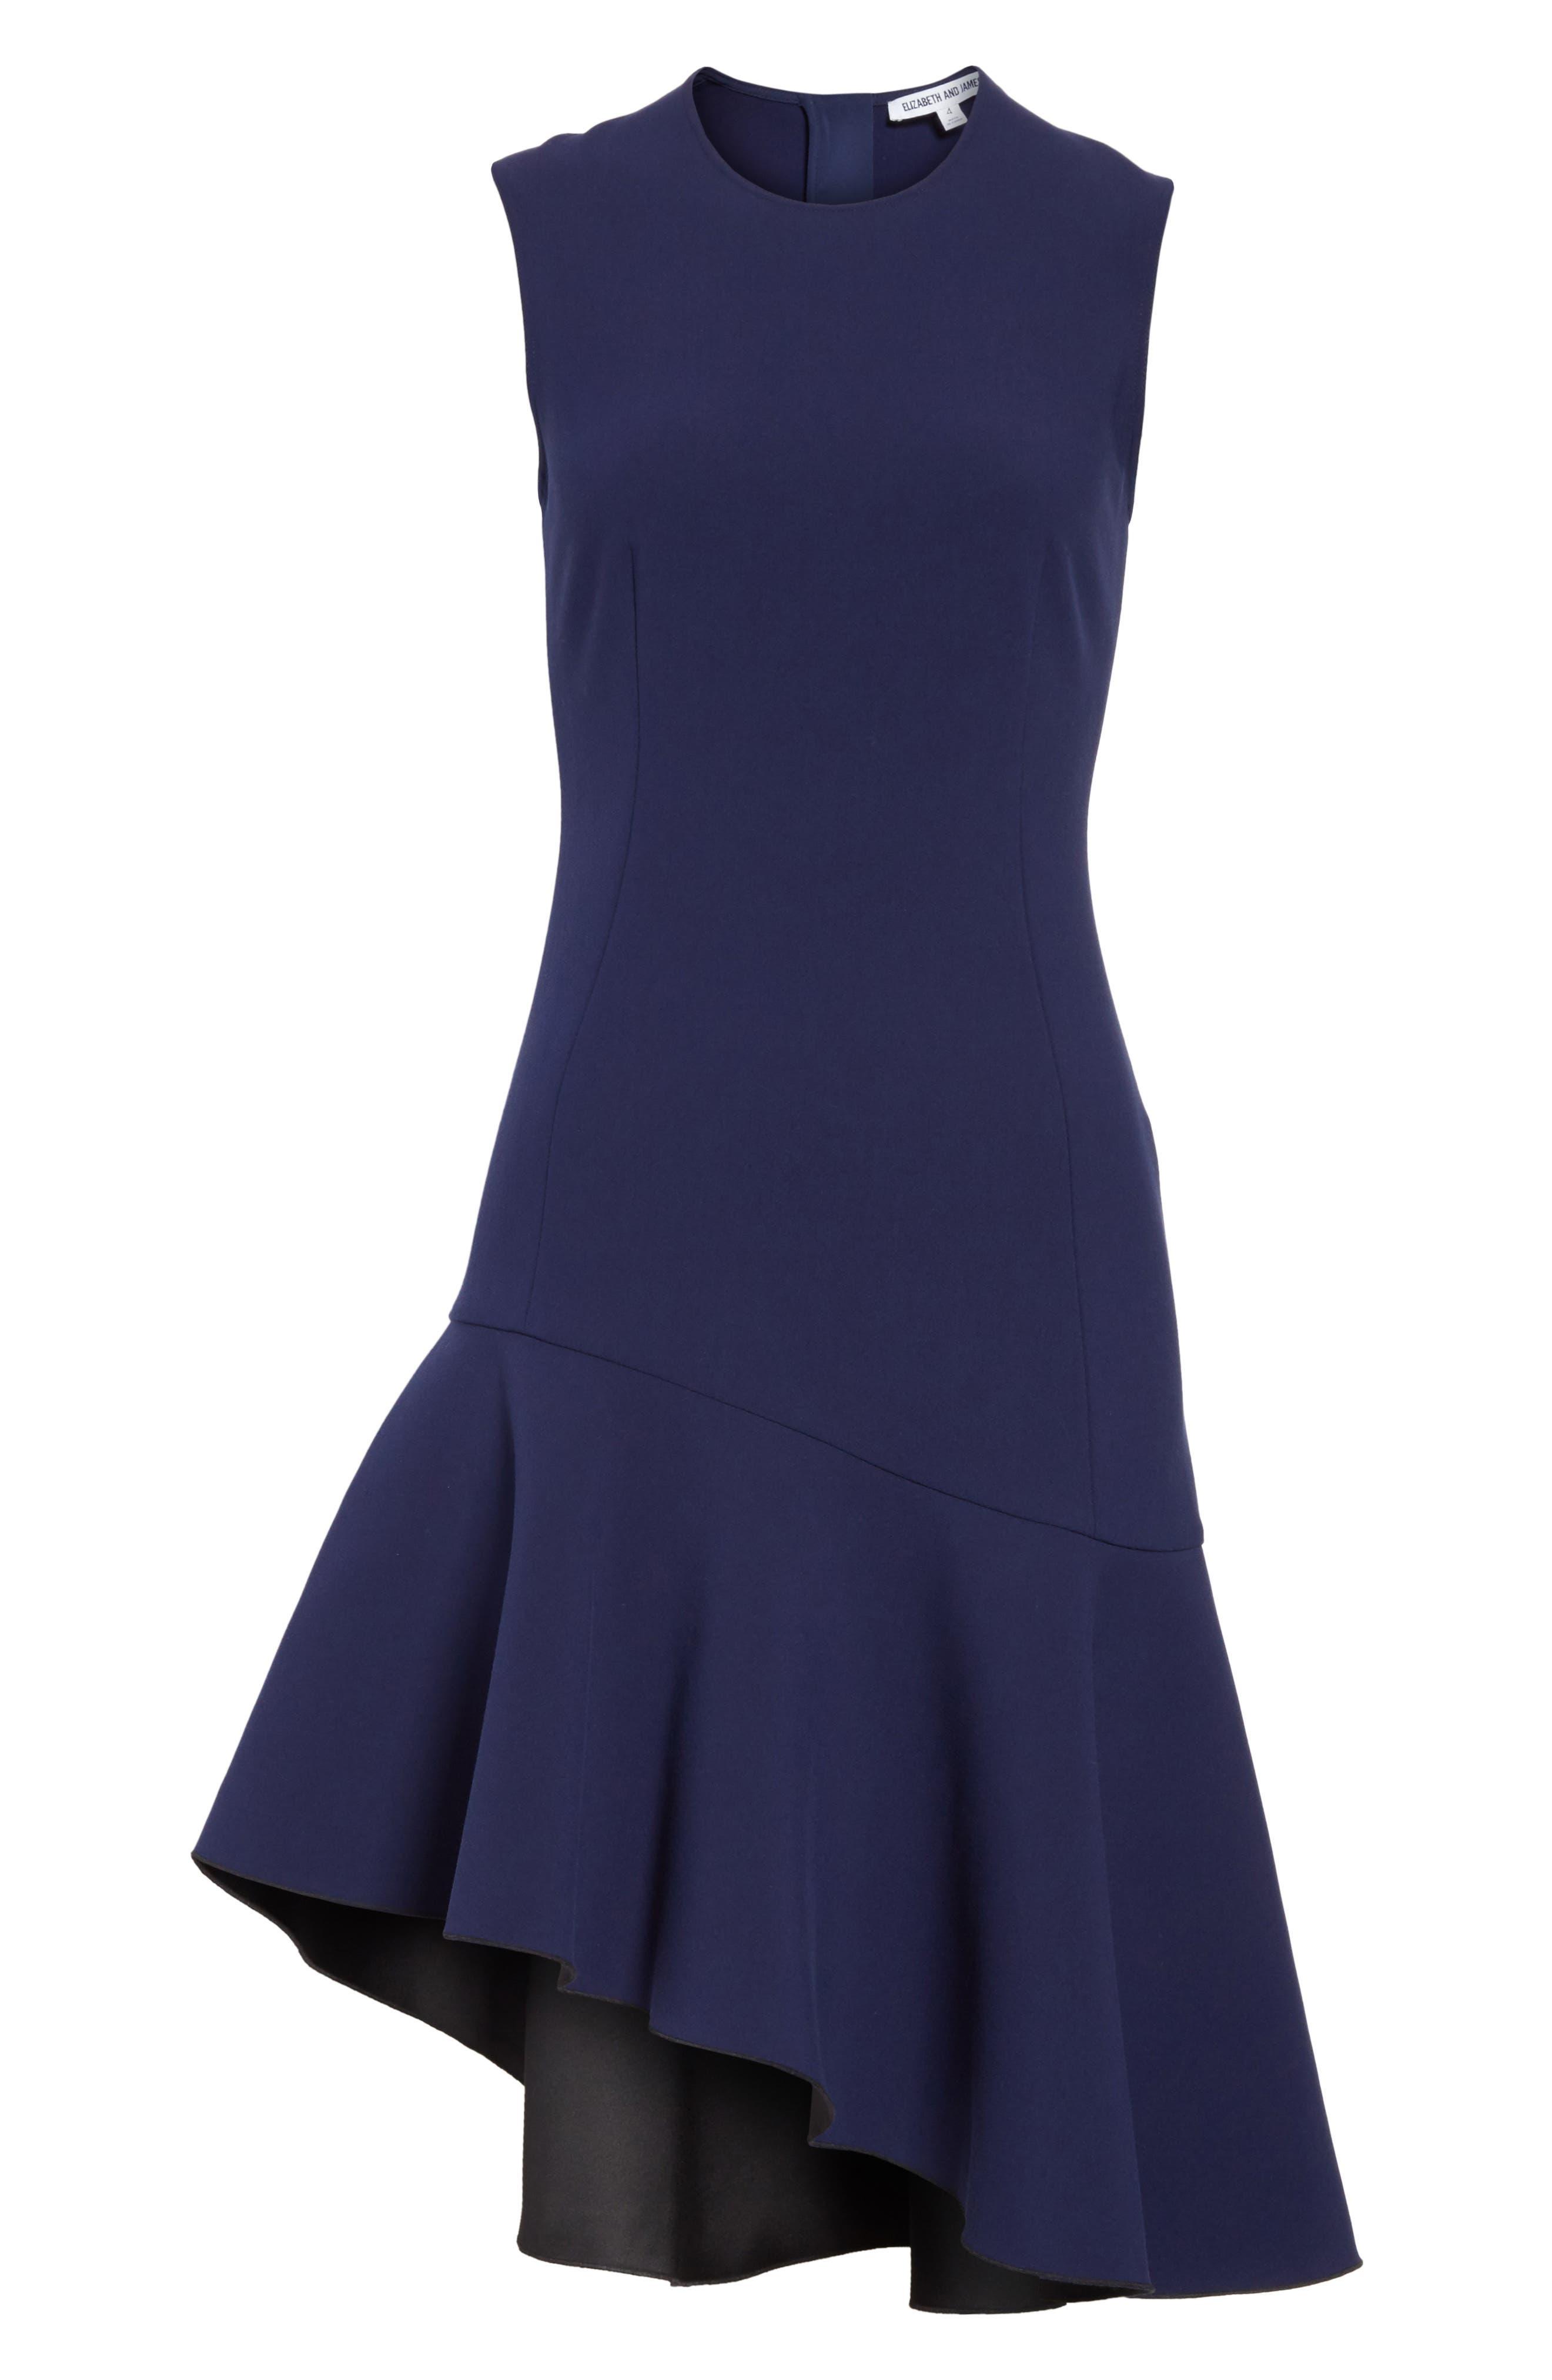 Dev Ruffle Fit & Flare Dress,                             Alternate thumbnail 6, color,                             Blue Violet/ Black